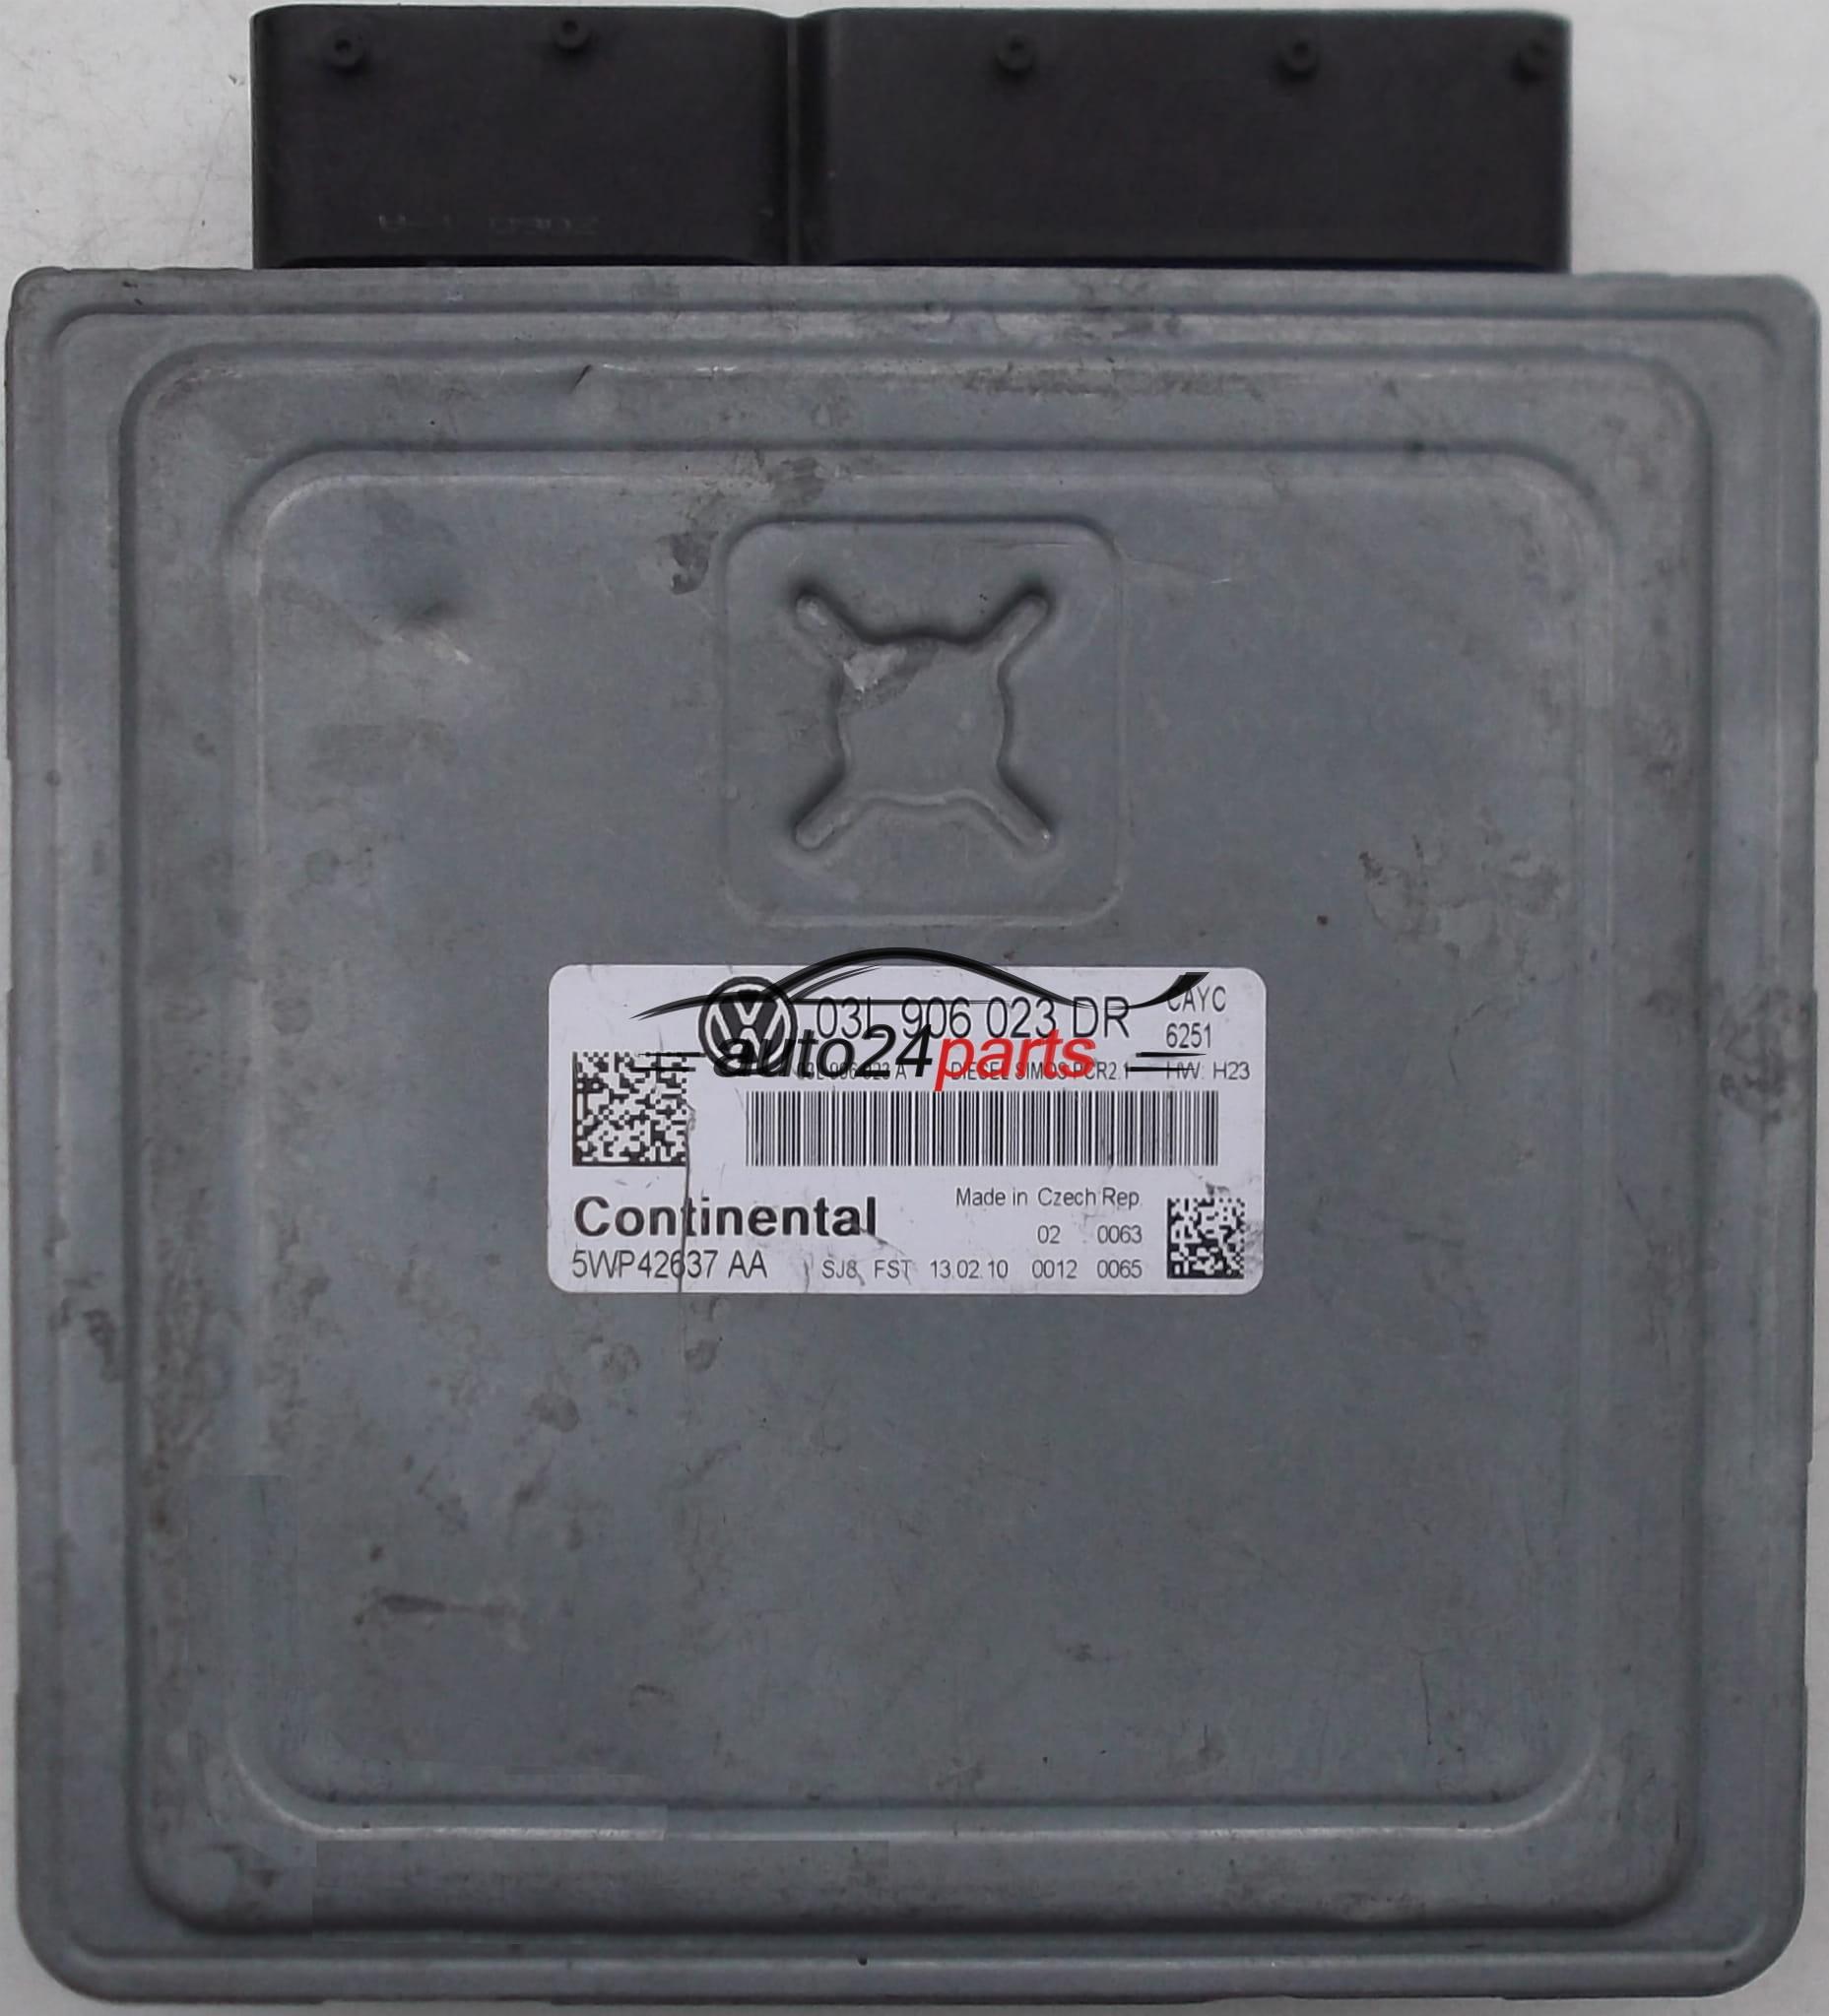 Ecu Engine Controller Vw Volkswagen Golf 1 6 Tdi